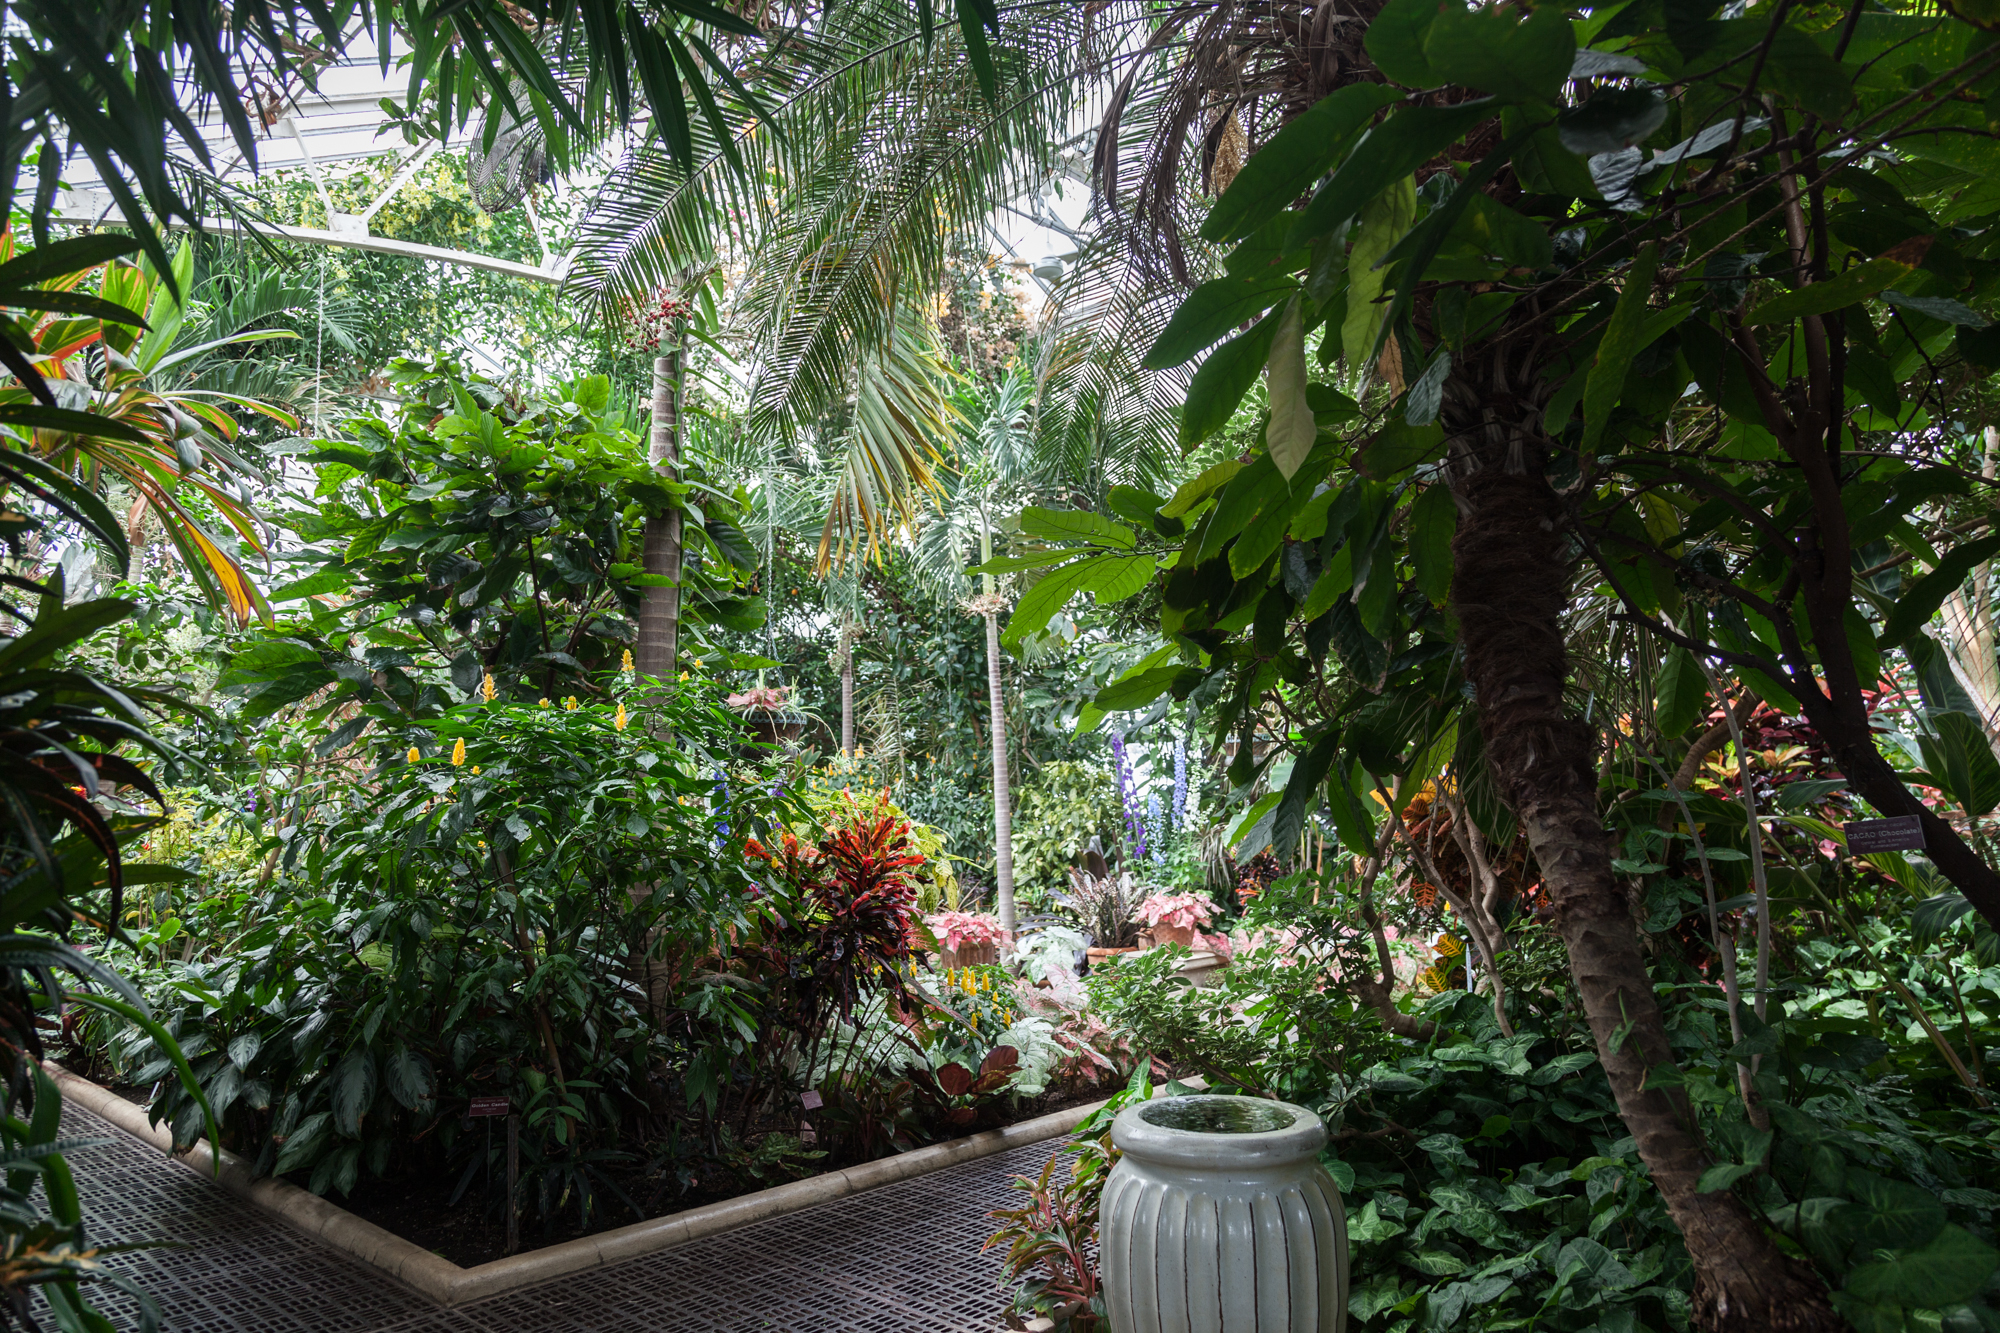 Planting-Fields-Arboretum-Greenhouse-Homestead-Brooklyn-Summer-Rayne-Oakes.jpg